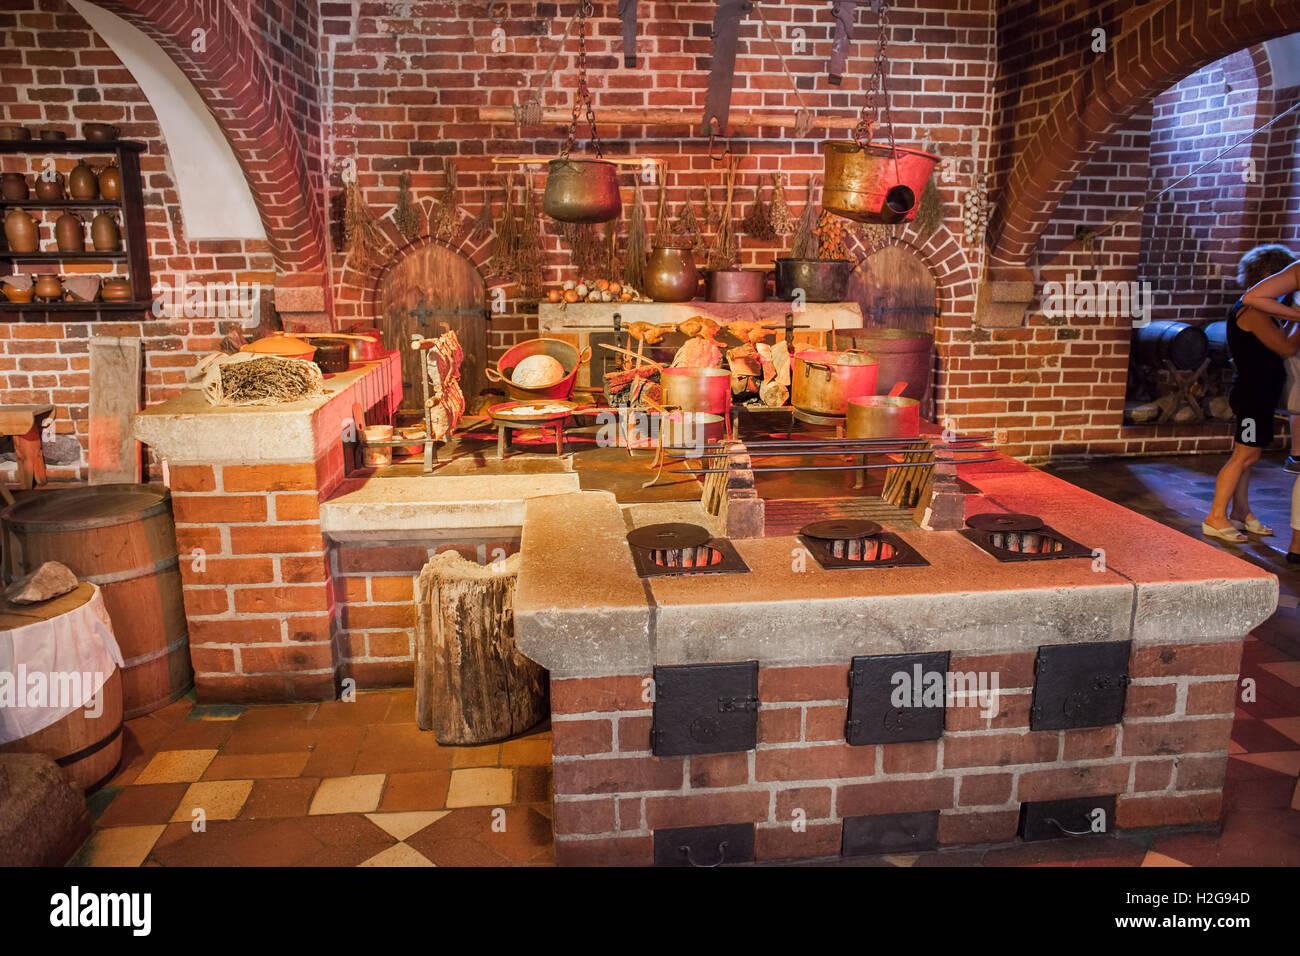 poland malbork castle interior medieval convent kitchen in high castle stock image